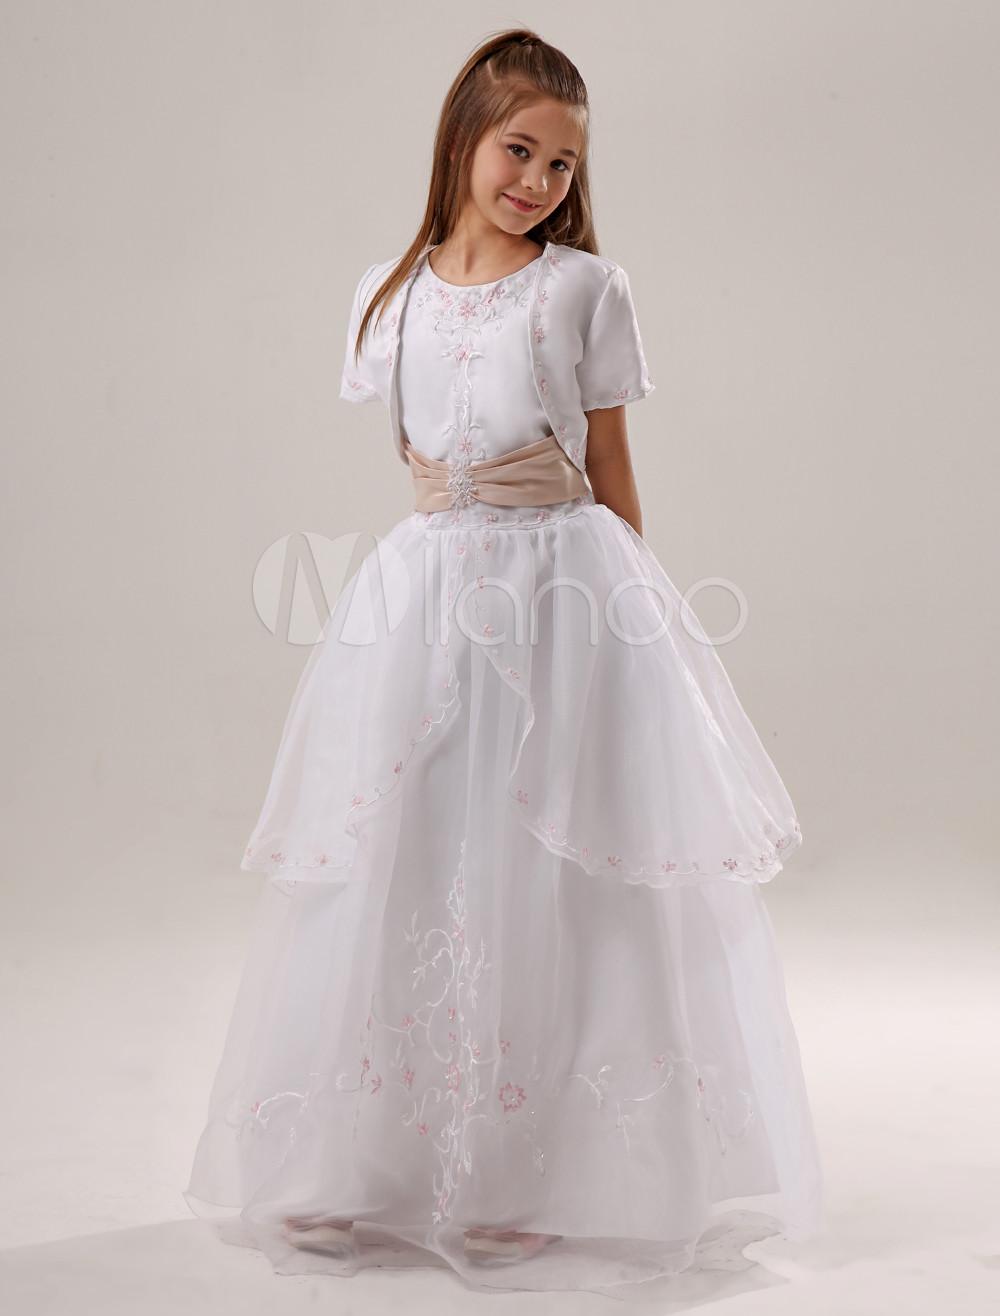 46341fe8062 White Flower Girl Dresses Embroidery Satin Ruched Sash Kids Princess ...